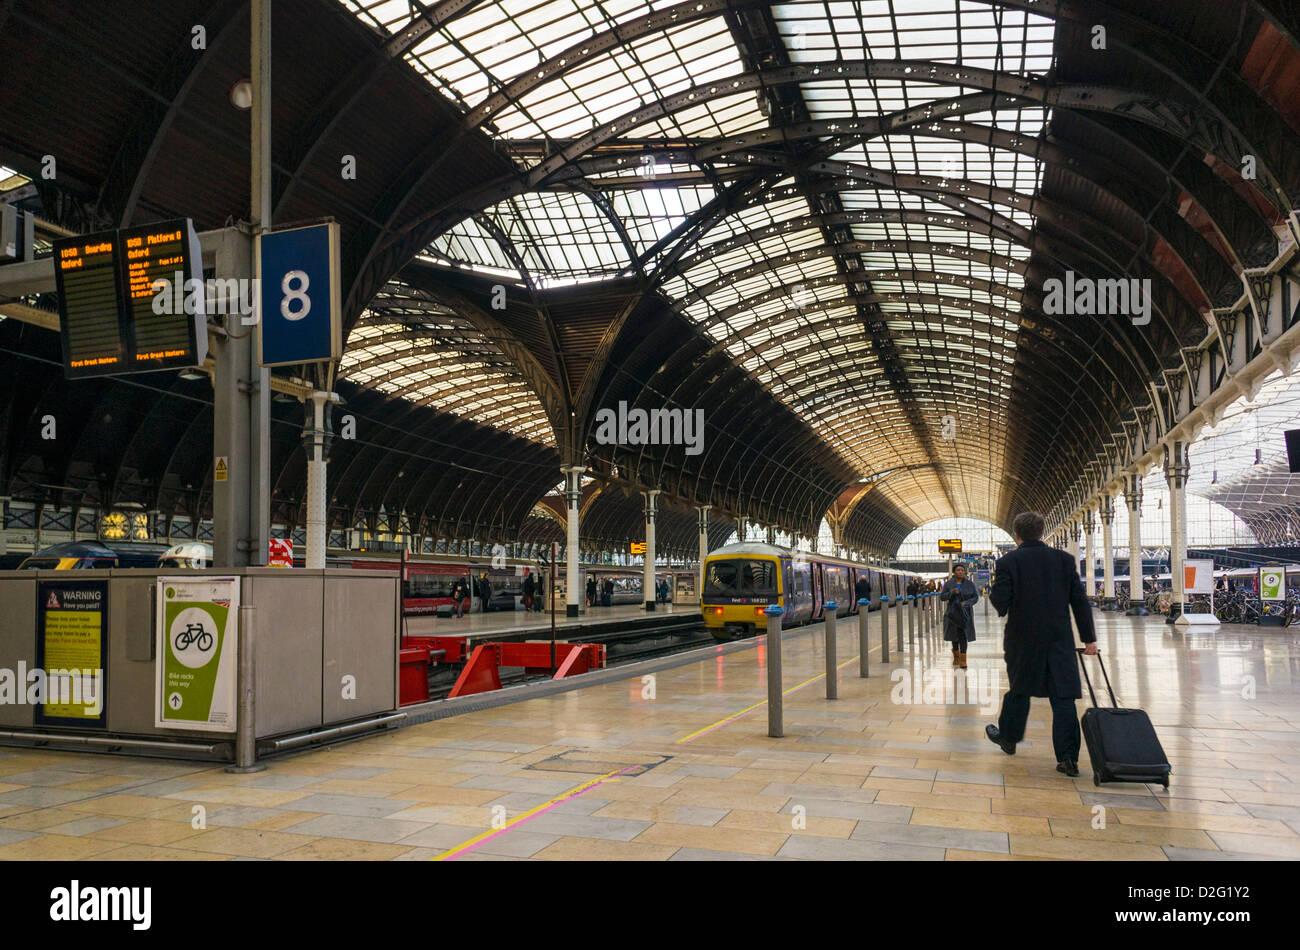 Train platform at Paddington station, London, UK - Stock Image